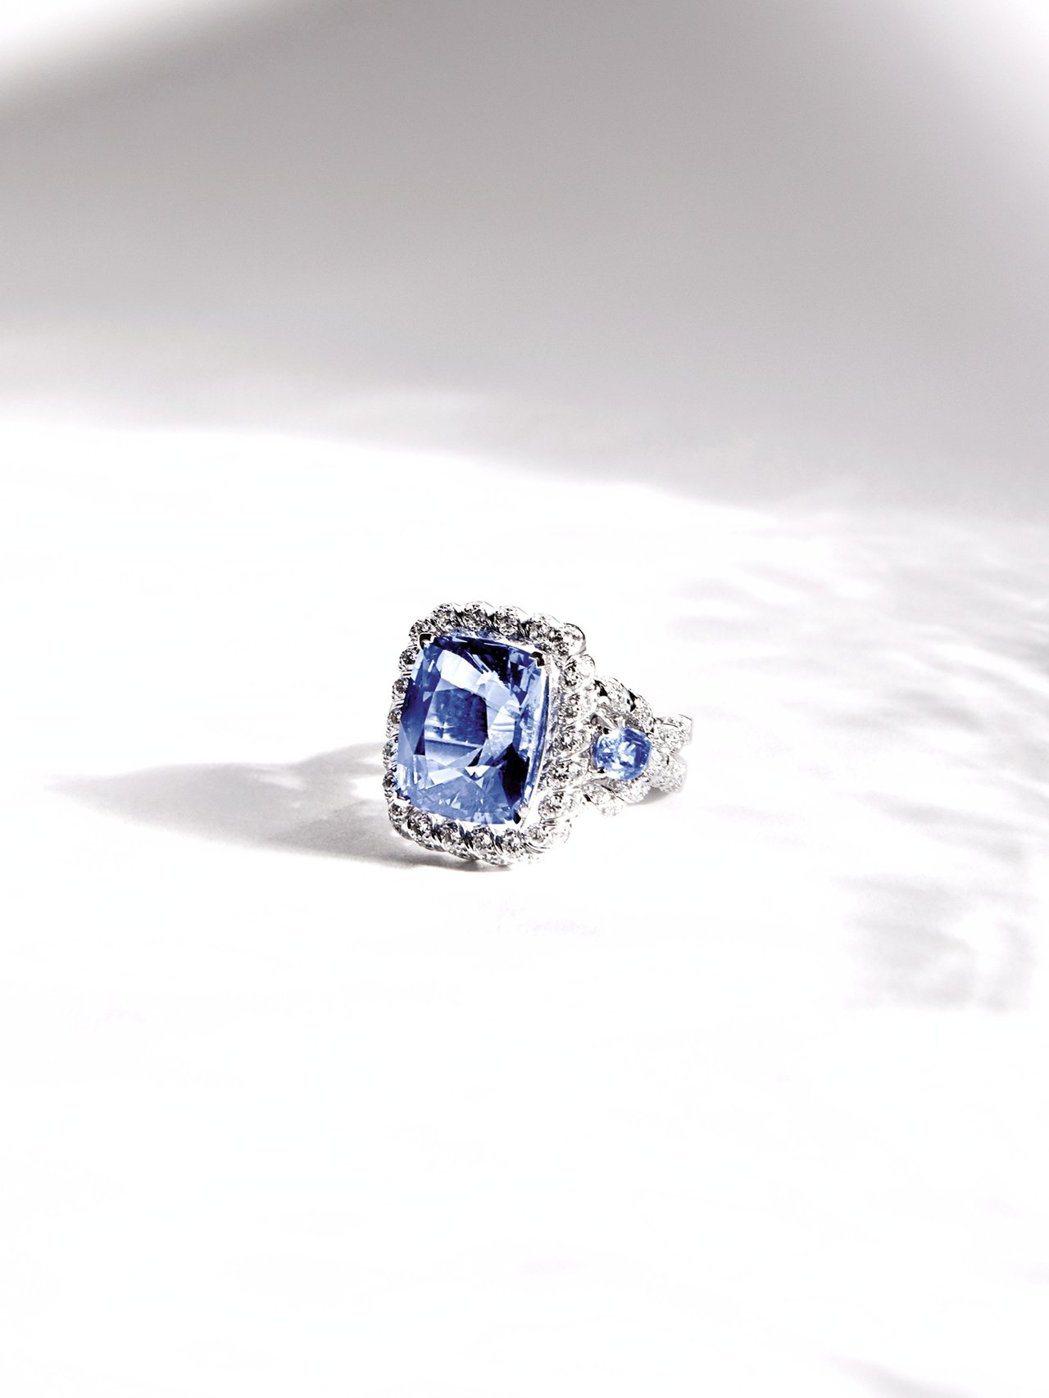 Turquoise Waters戒指,以18K白金鑲嵌12.39克拉枕形切割藍寶...